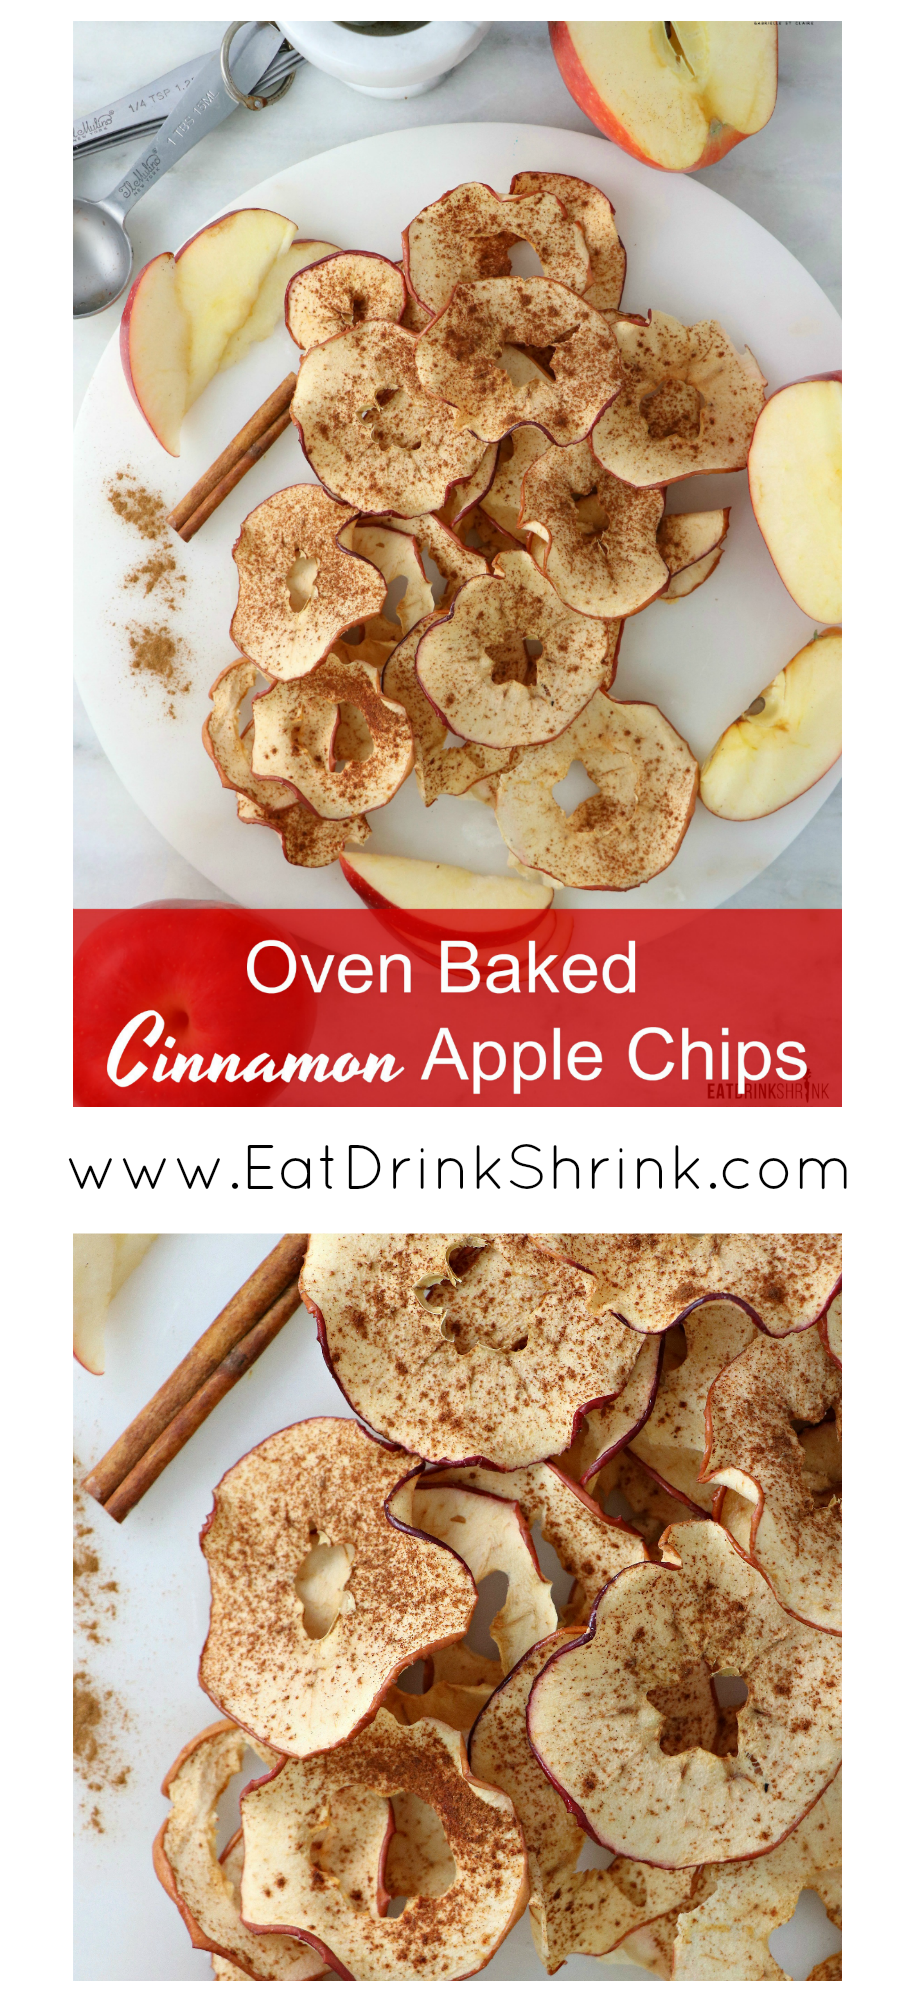 Vegan Baked Cinnamon Apple Chips - Eat. Drink. Shrink.